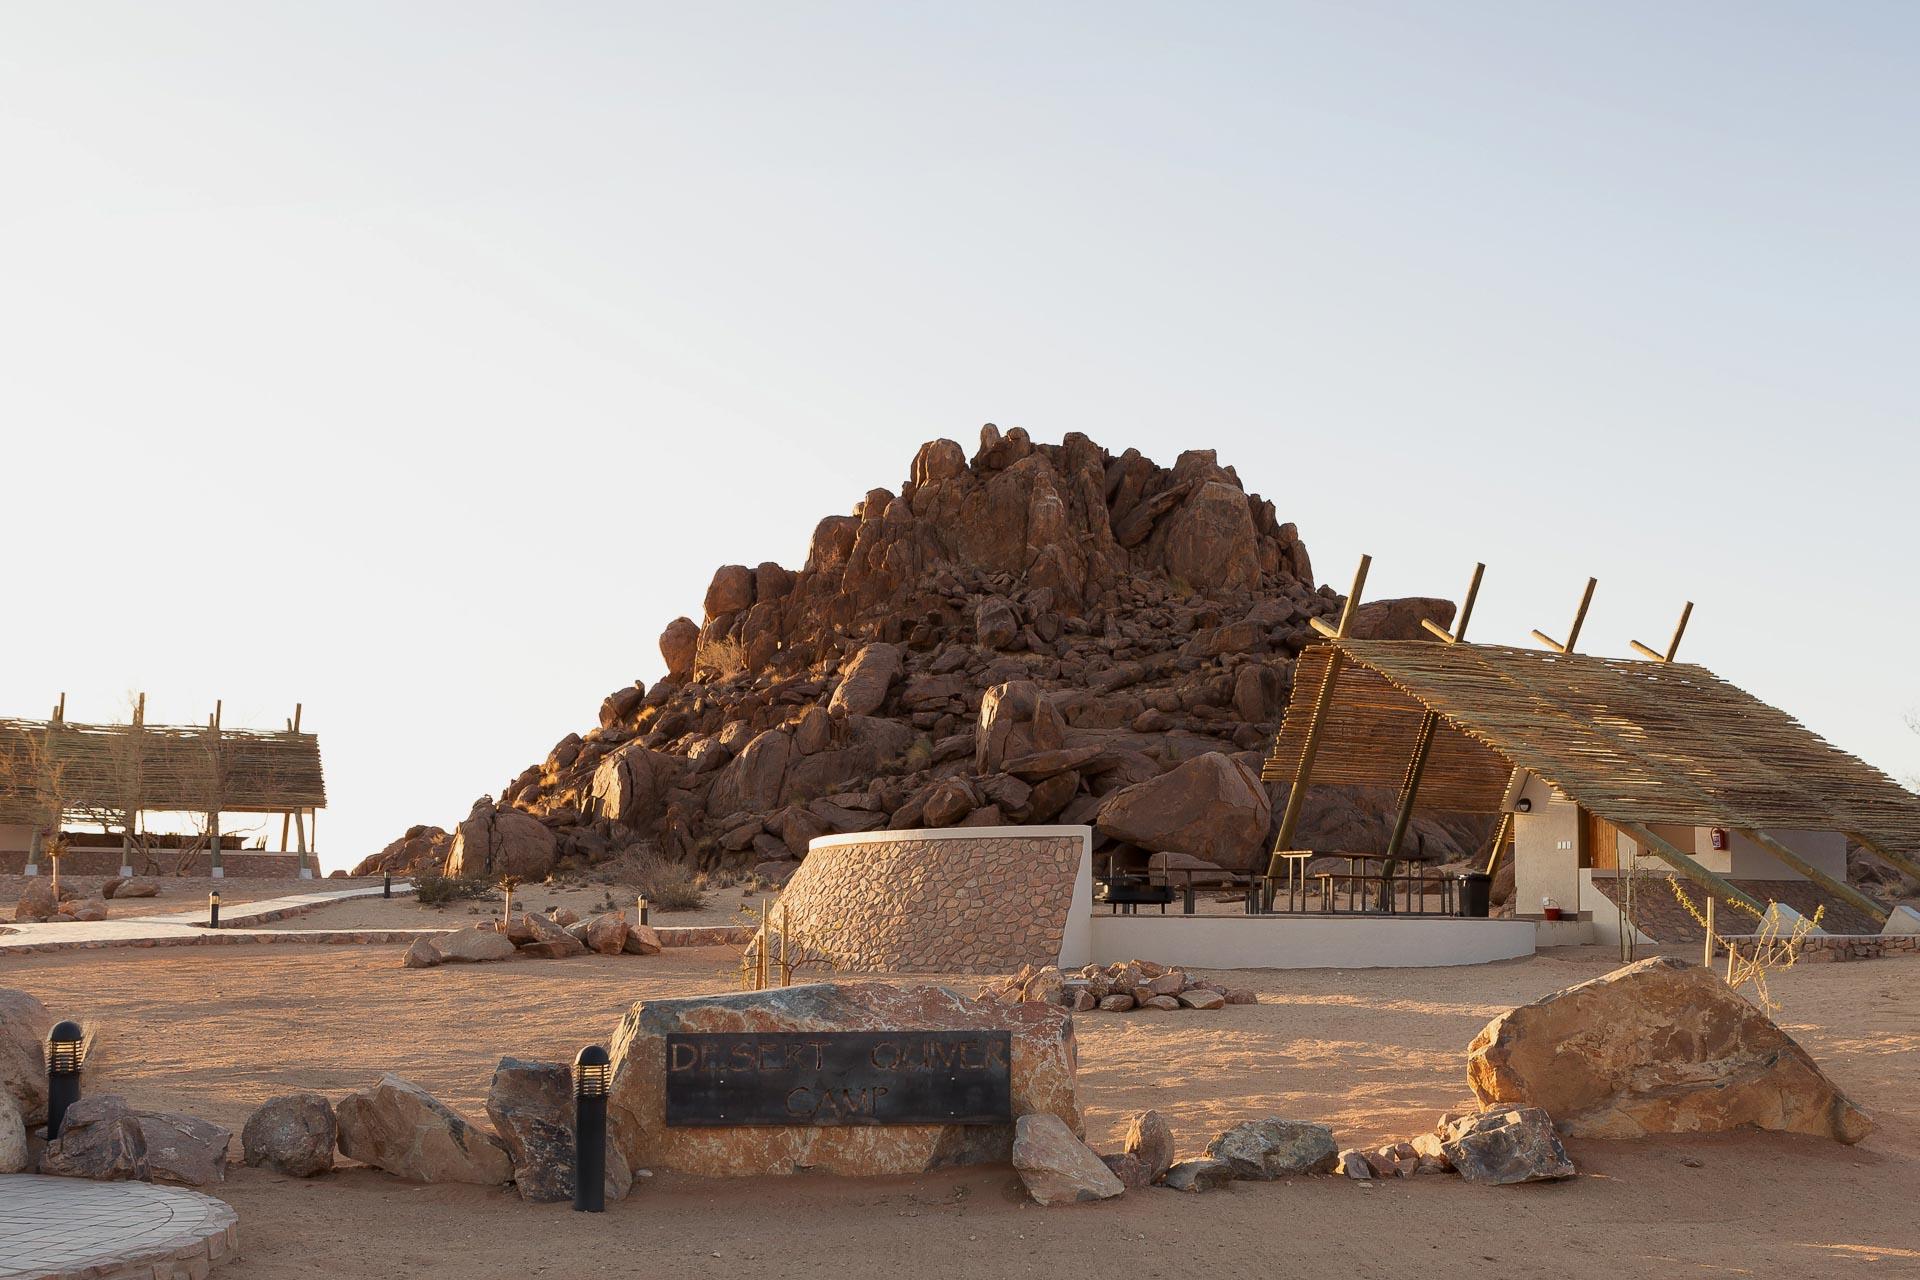 Desert-Quiver-Camp-Namibia-1